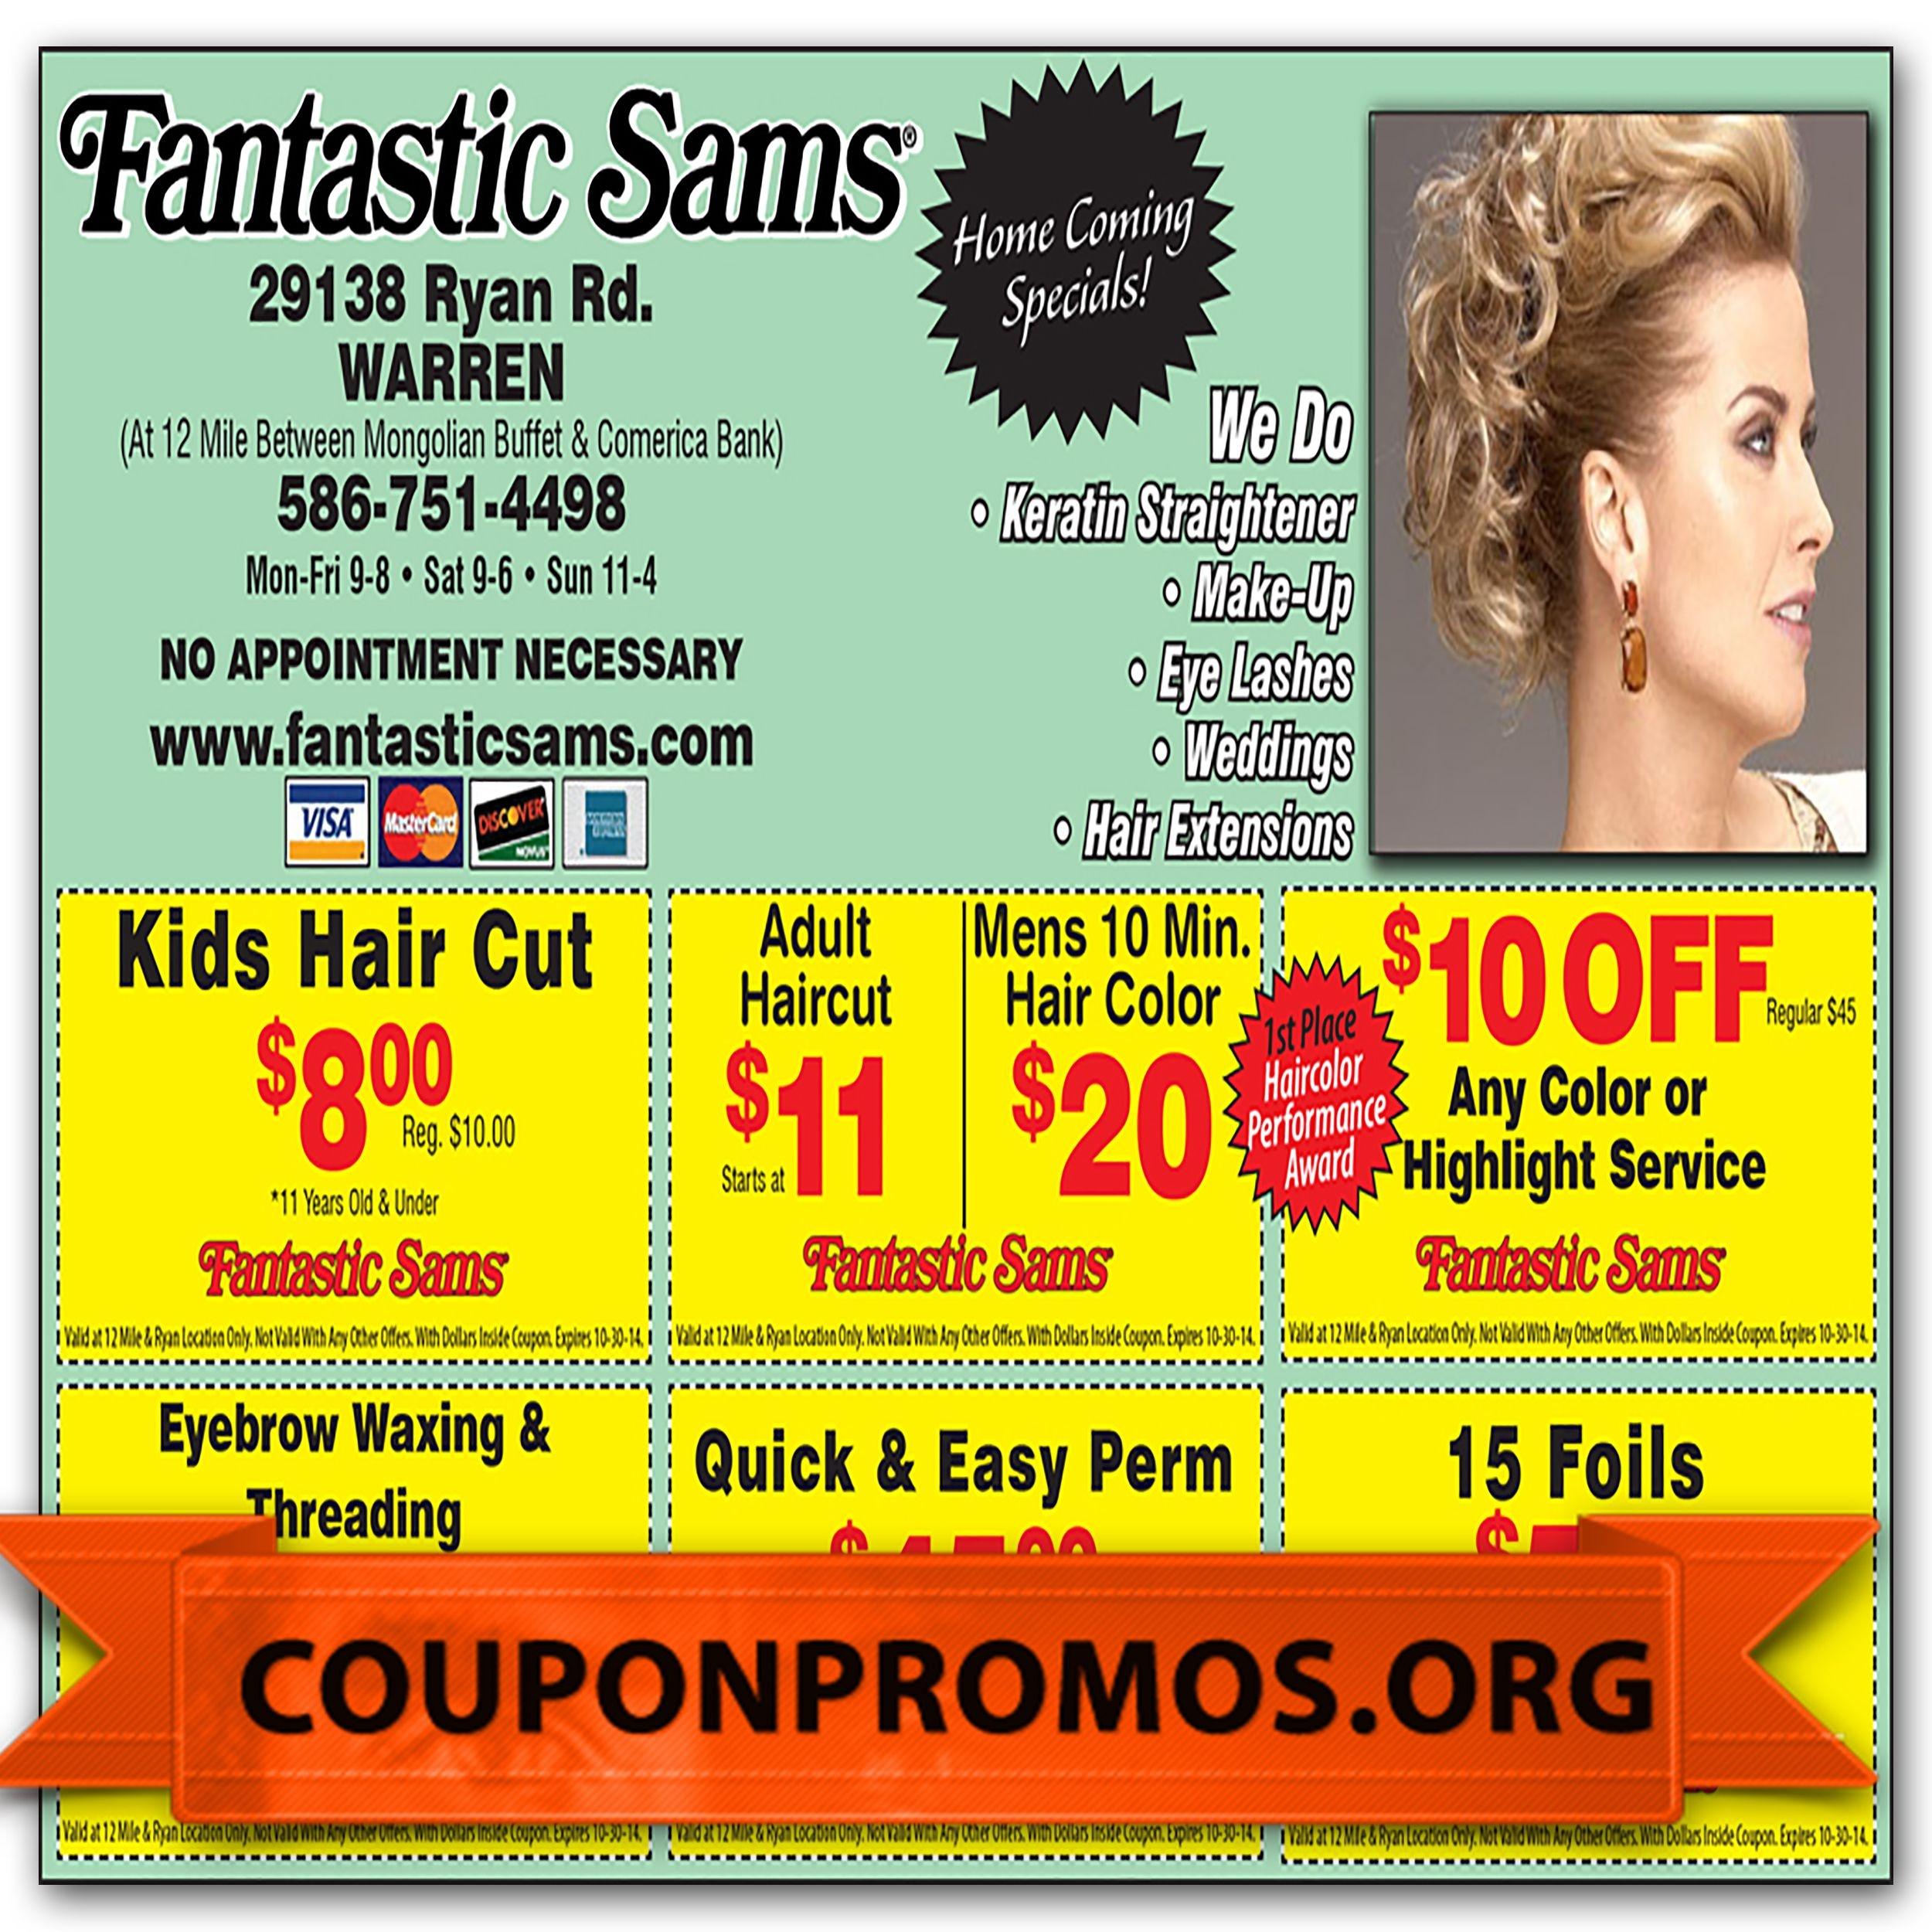 Free Fantastic Sams Discount Coupons Printable For November December - Free Printable Coupons For Fantastic Sams